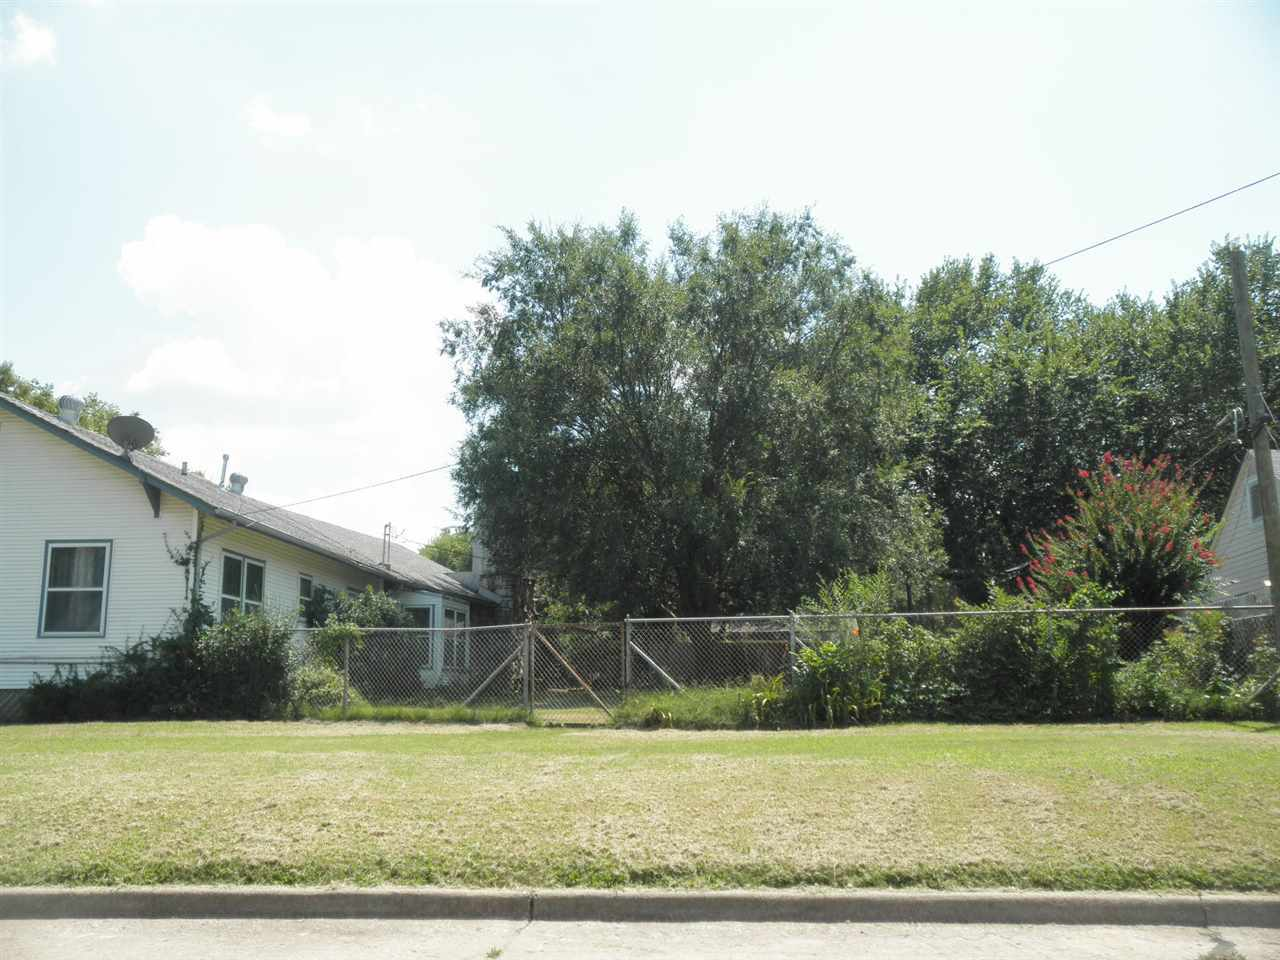 #century21groupone,#homesforsaleponcacity,#poncacityrealestate | 840 N Birch  Ponca City, OK 74601 6